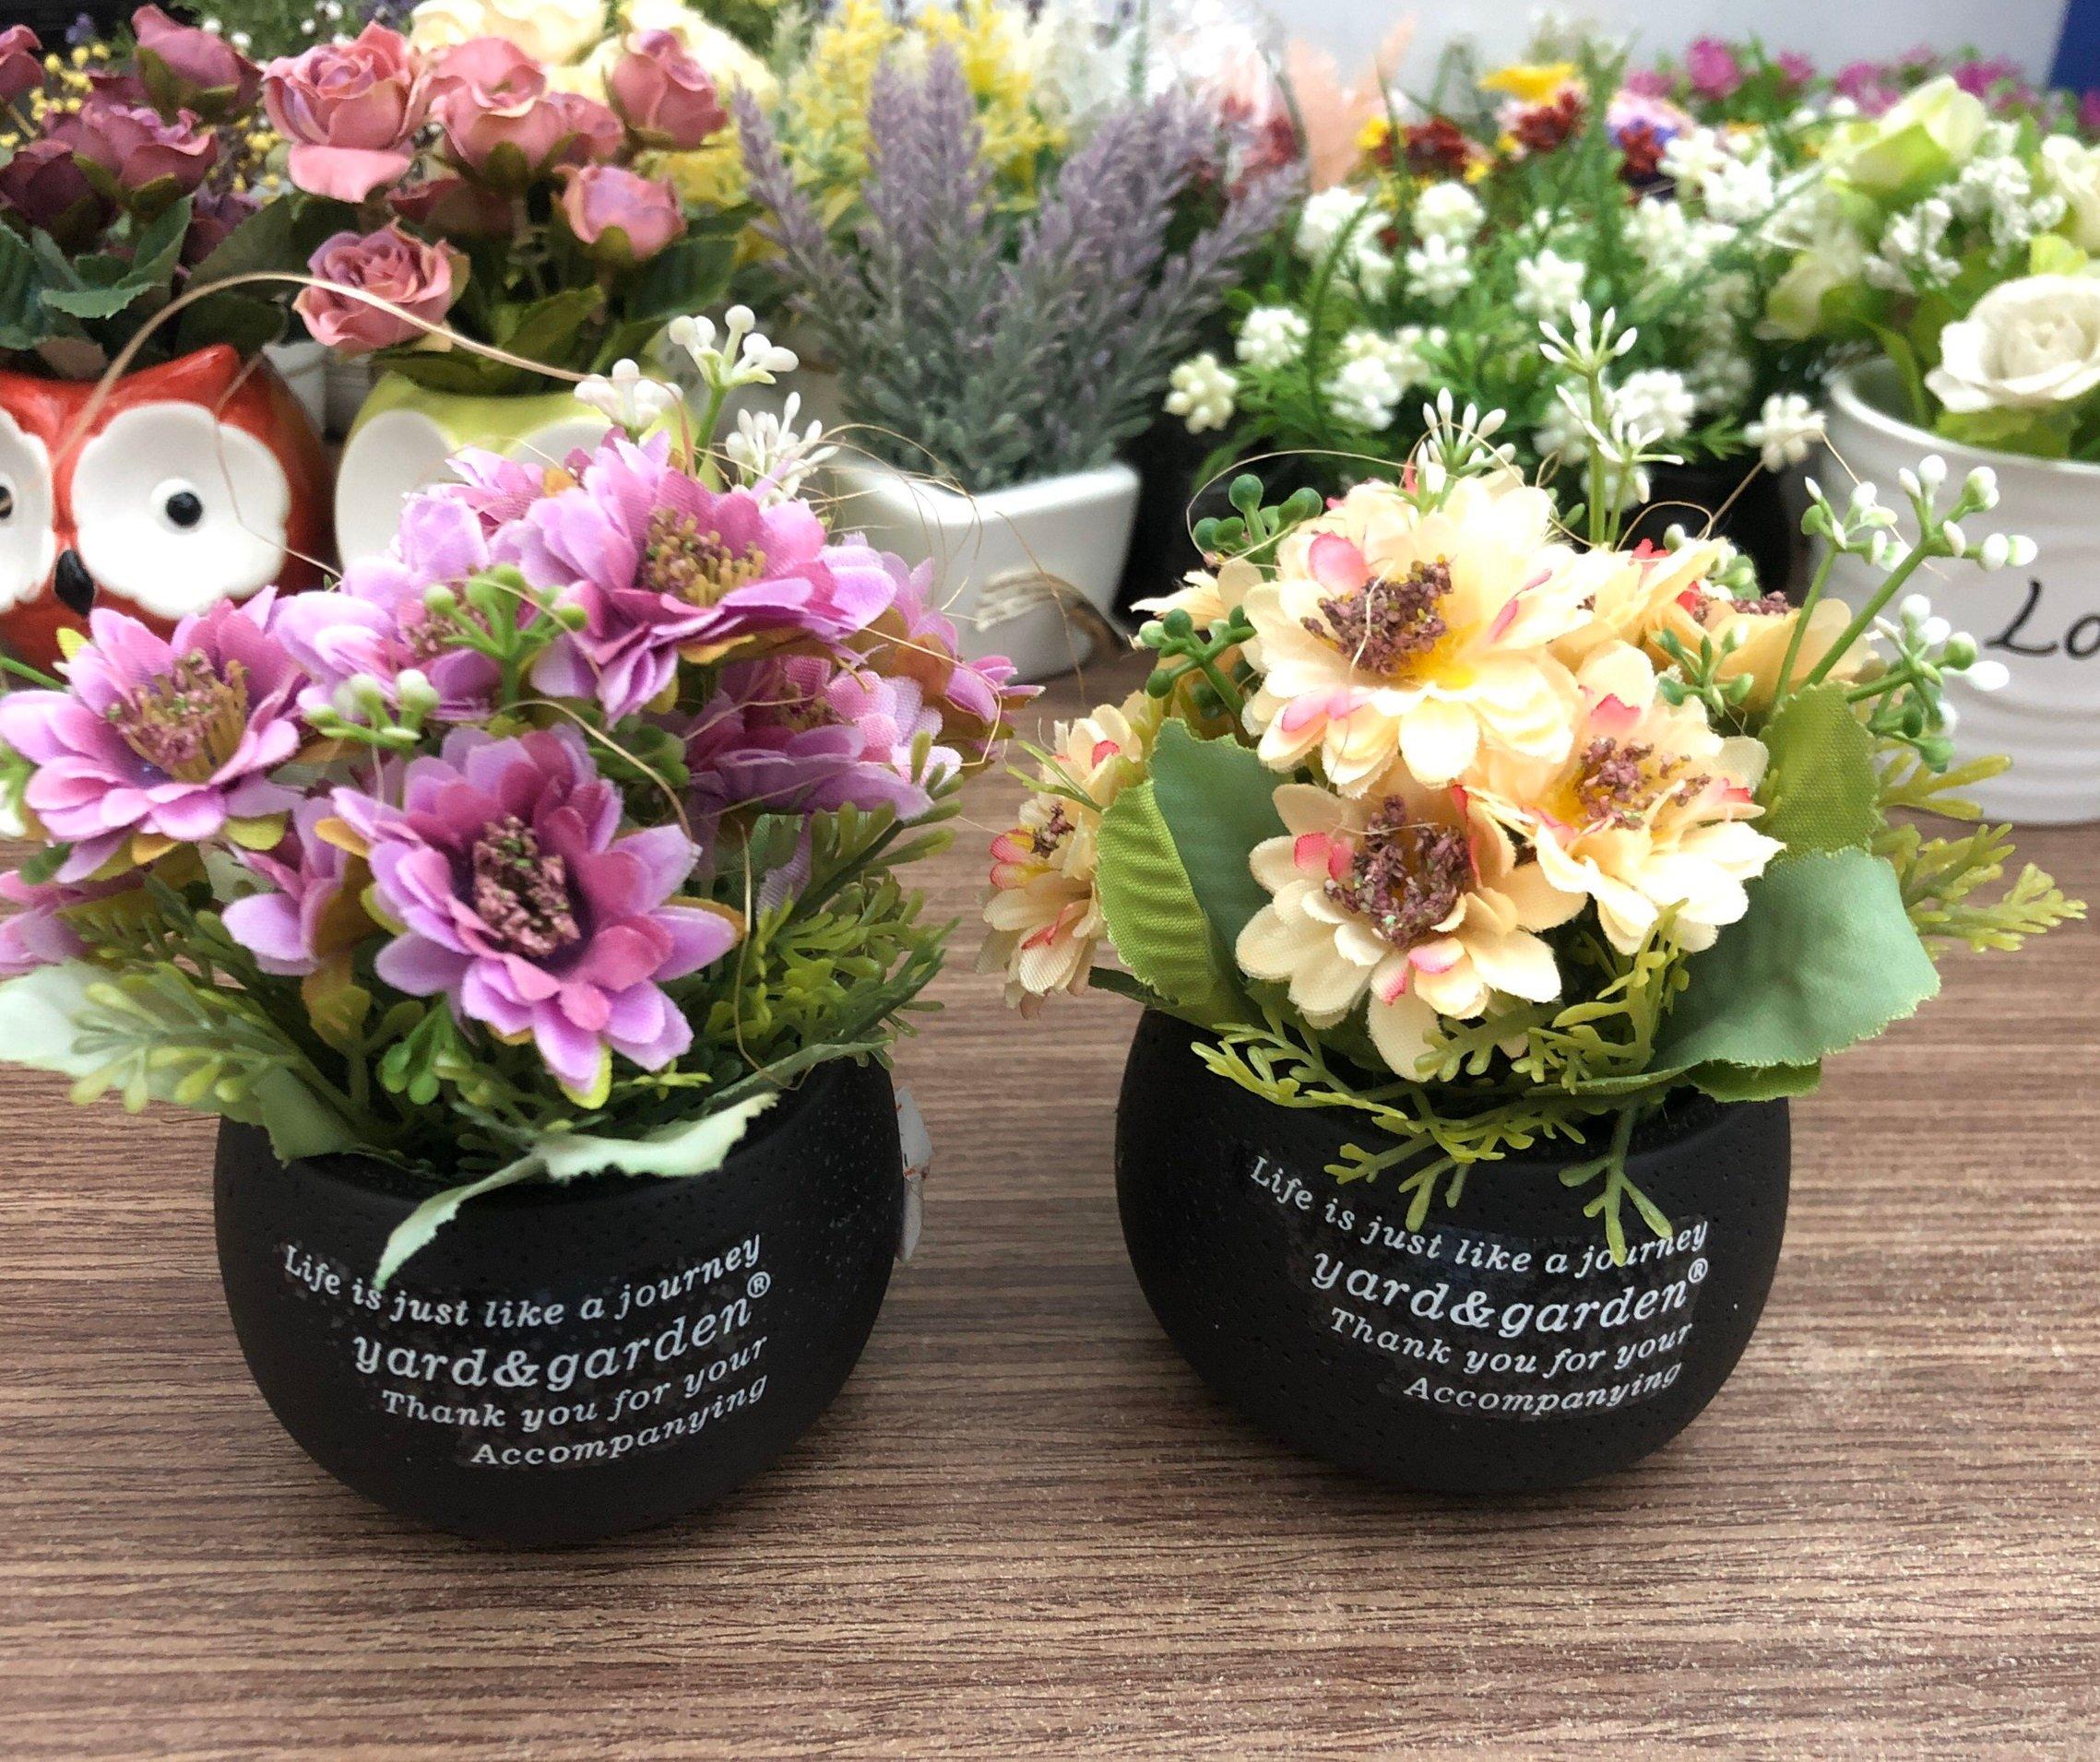 Chậu hoa để bàn yard & garden